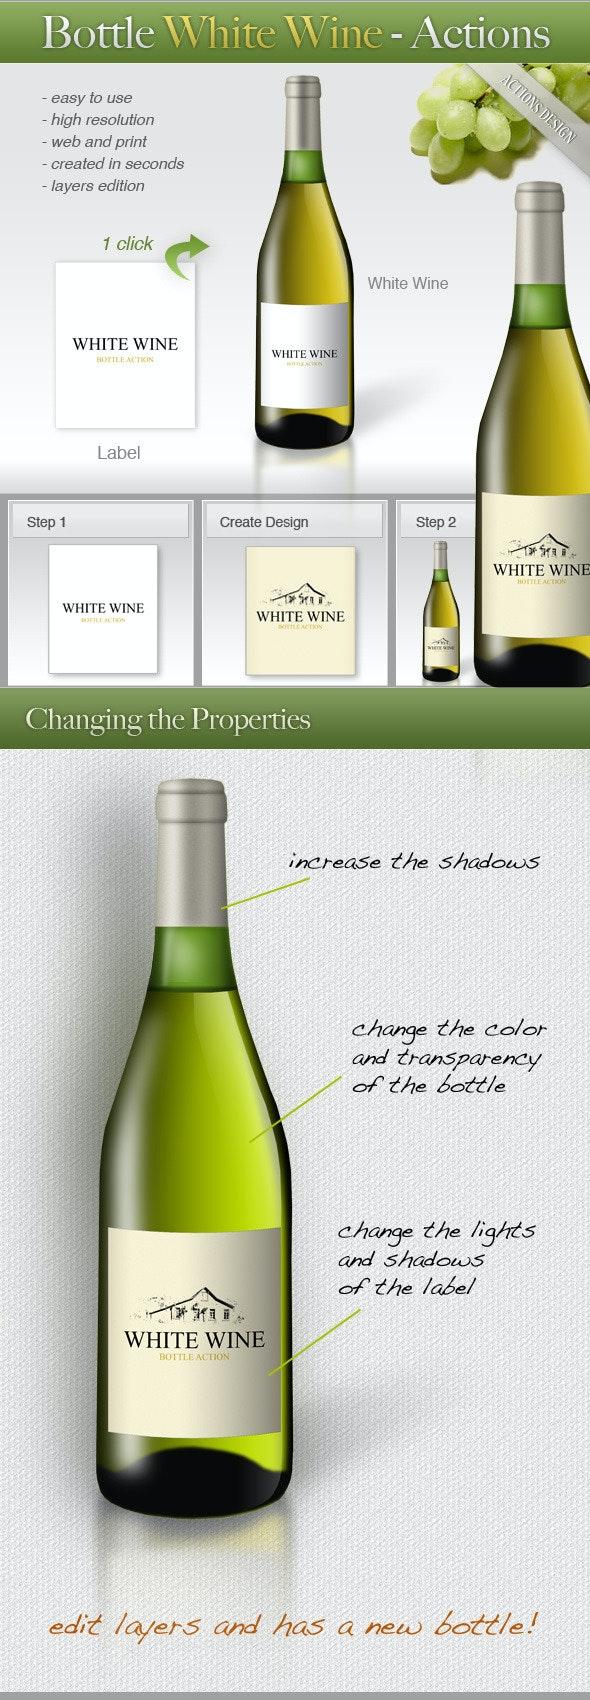 Bottle White Wine - Utilities Actions